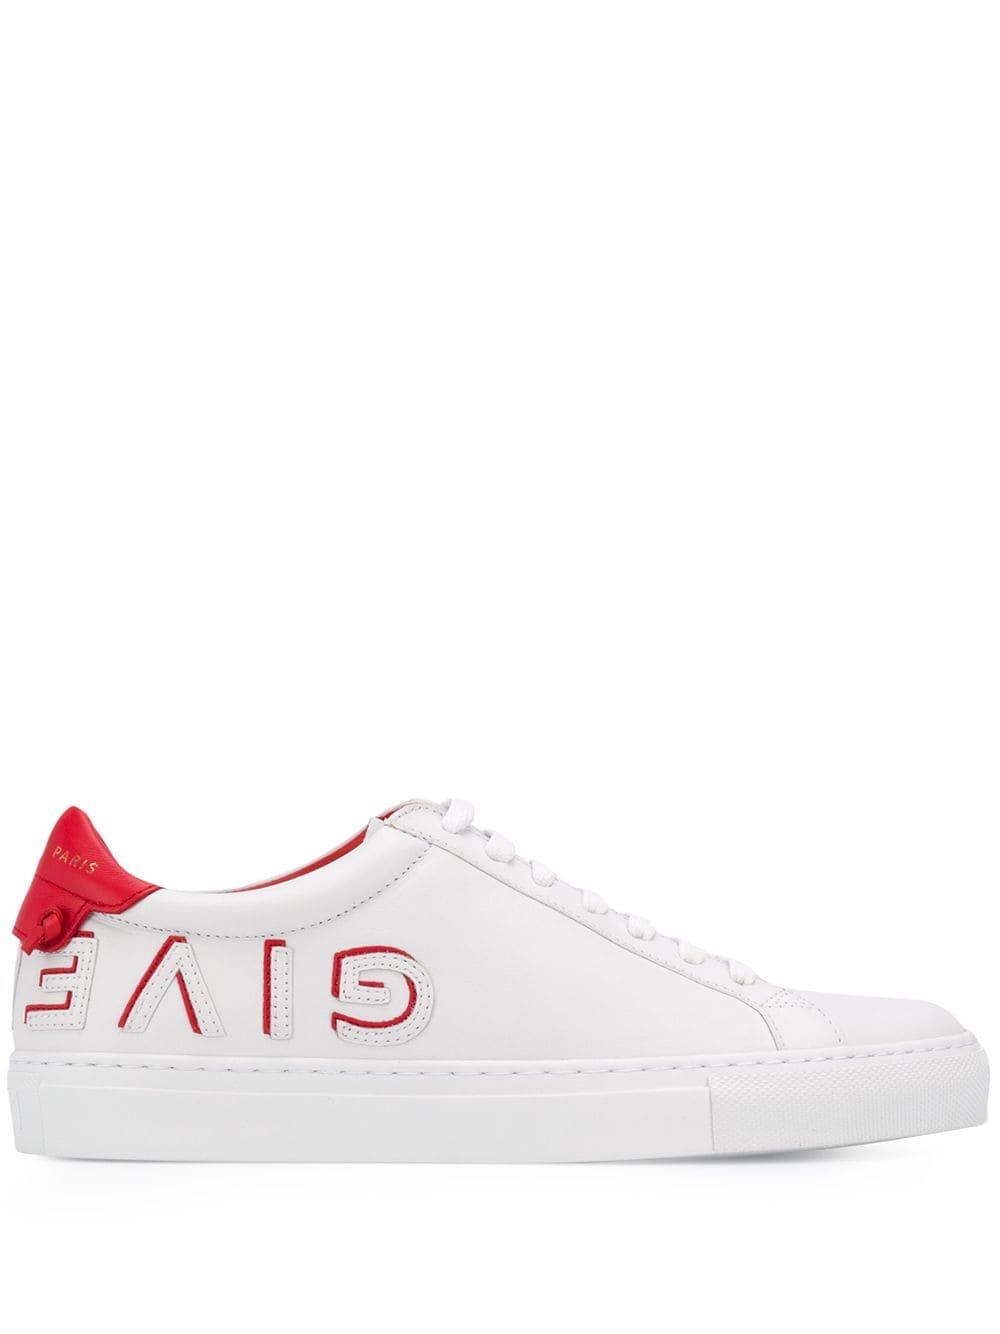 Urban Street L Sneakers